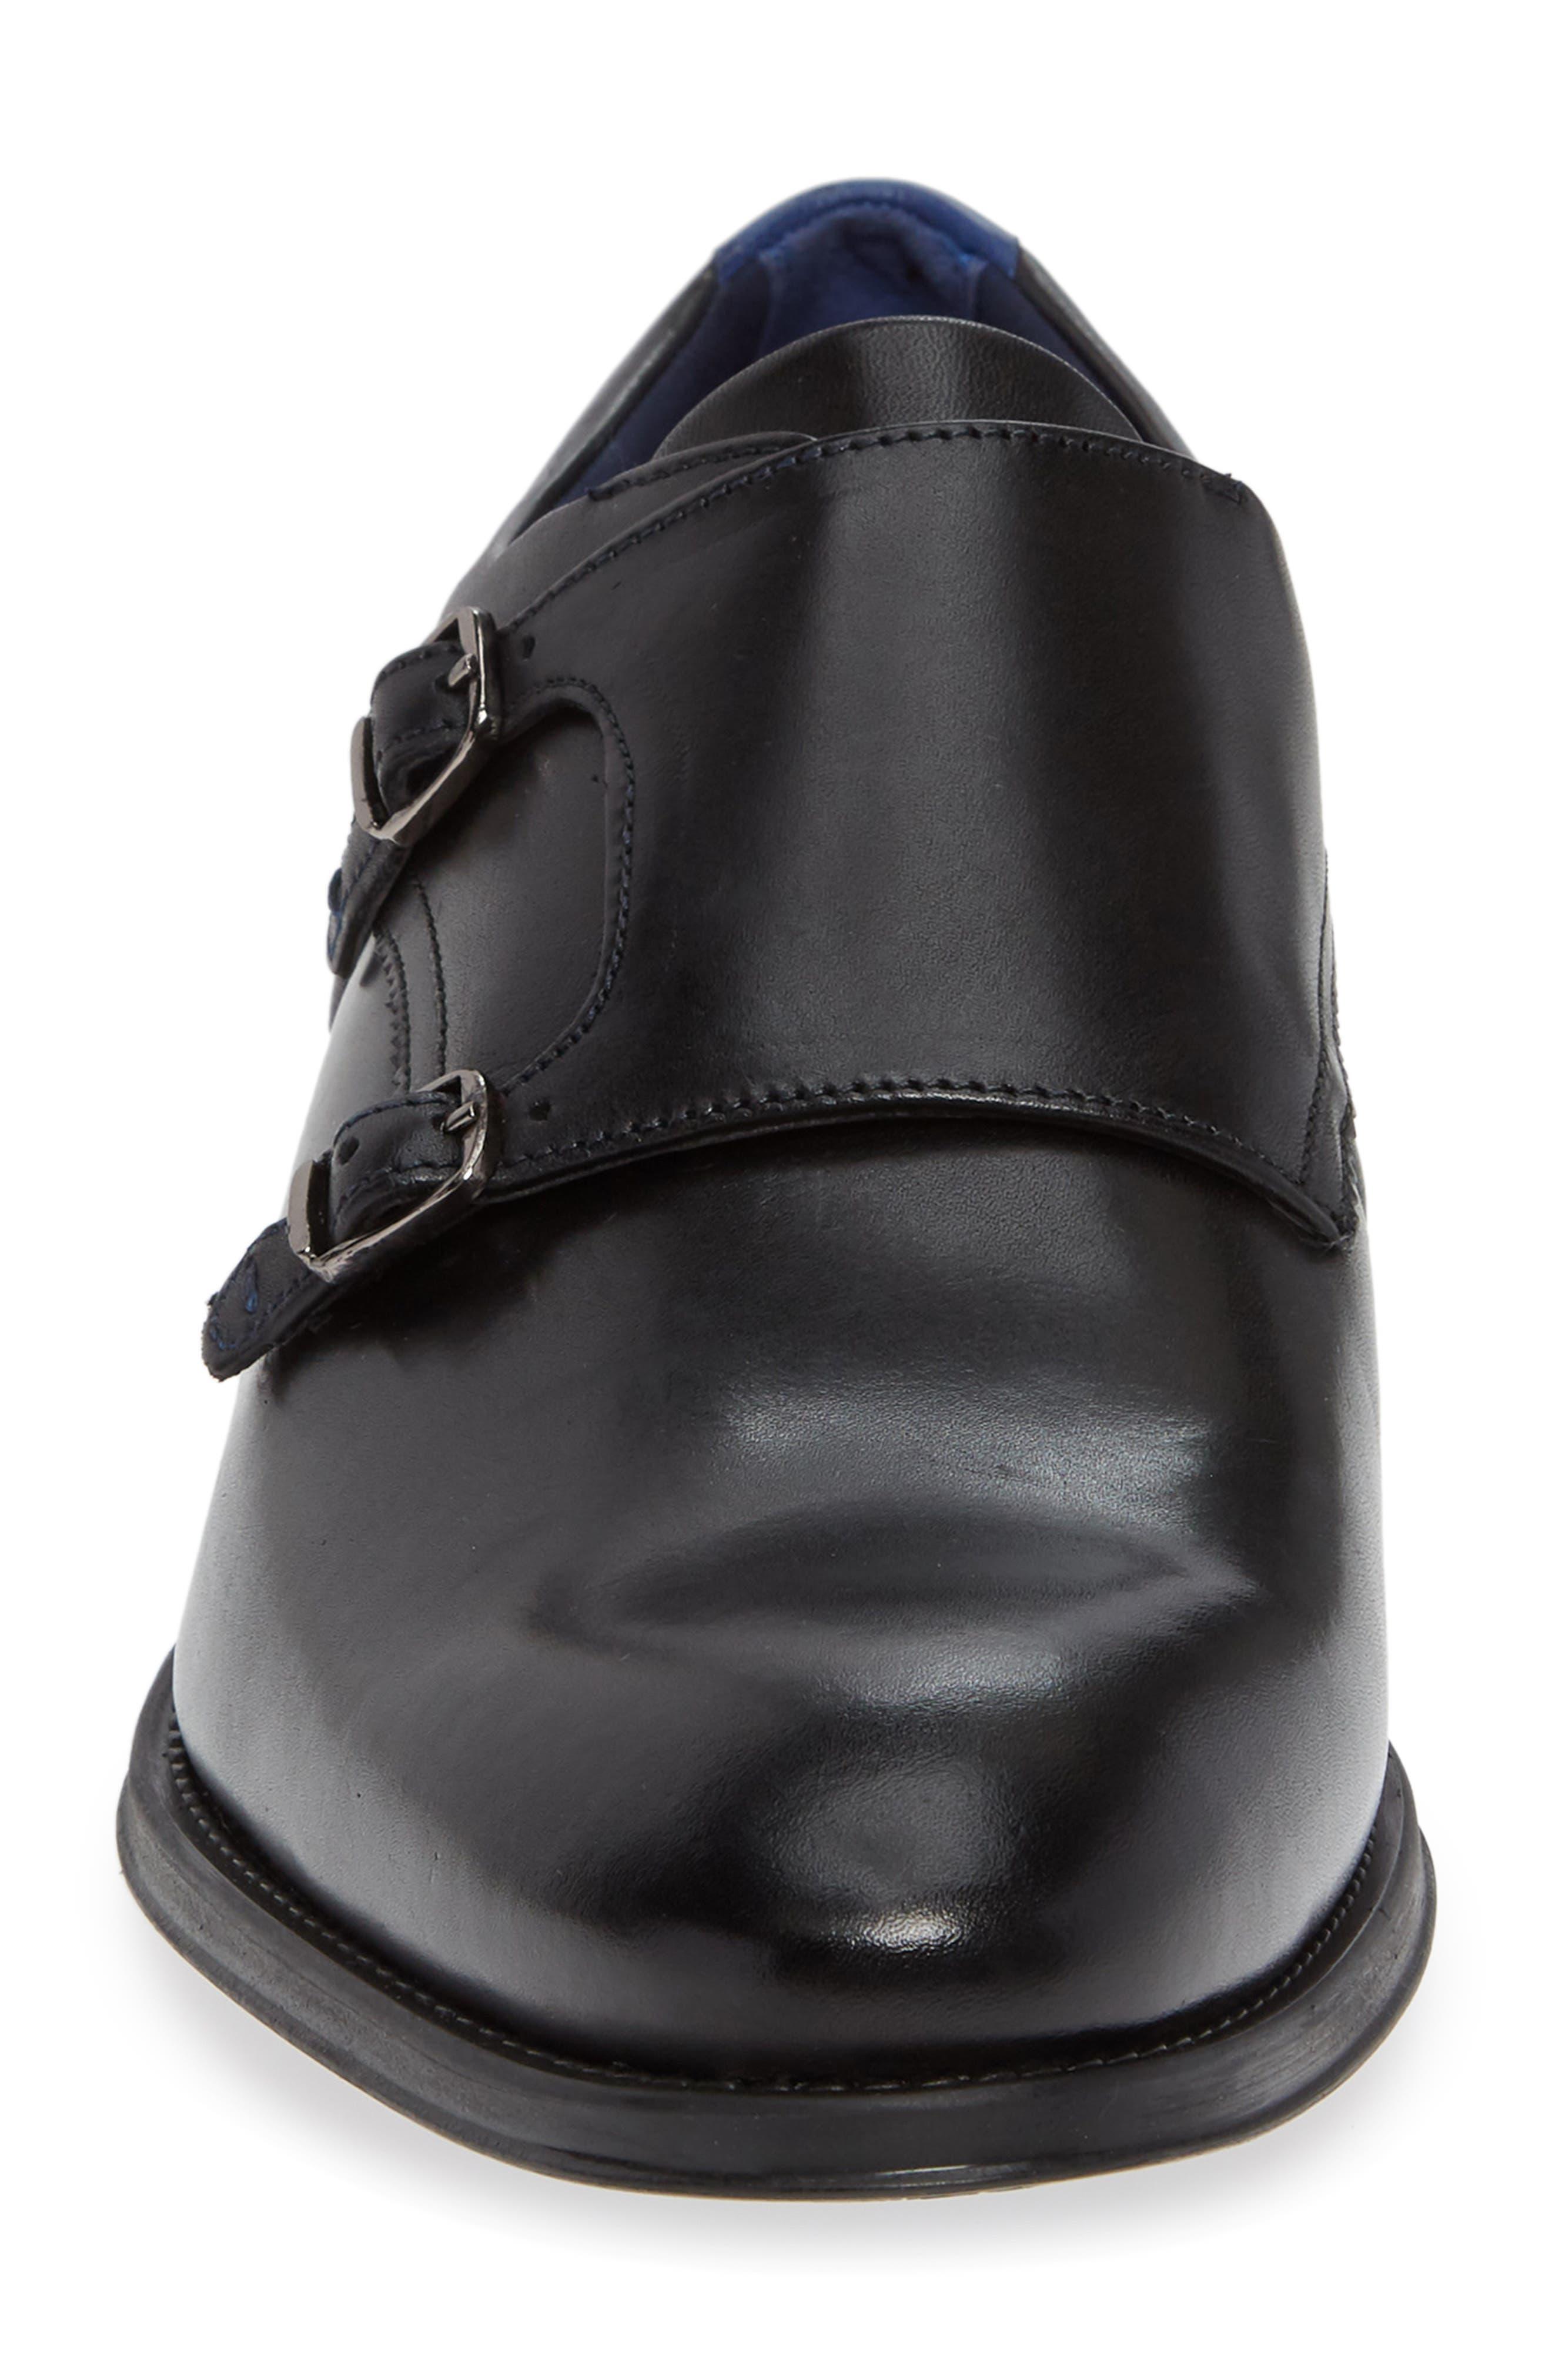 TED BAKER LONDON, Cathon Double Buckle Monk Shoe, Alternate thumbnail 4, color, BLACK LEATHER